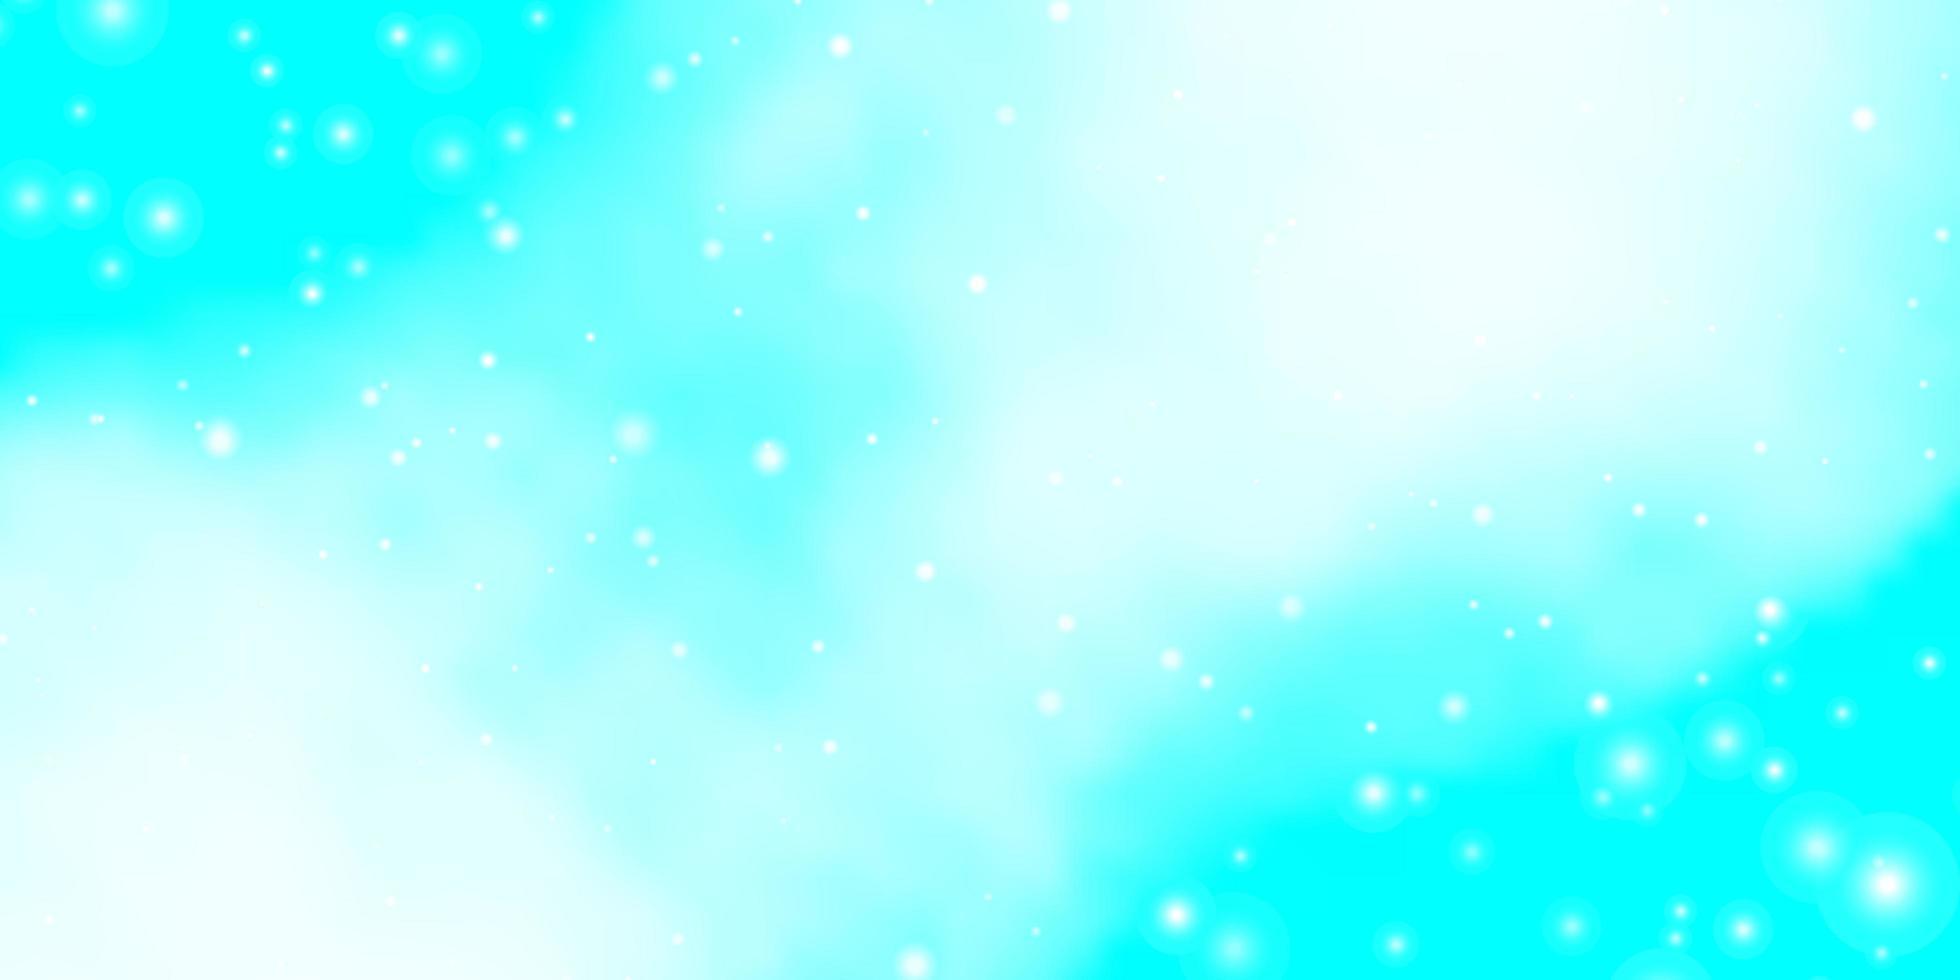 fondo azul claro con estrellas. vector